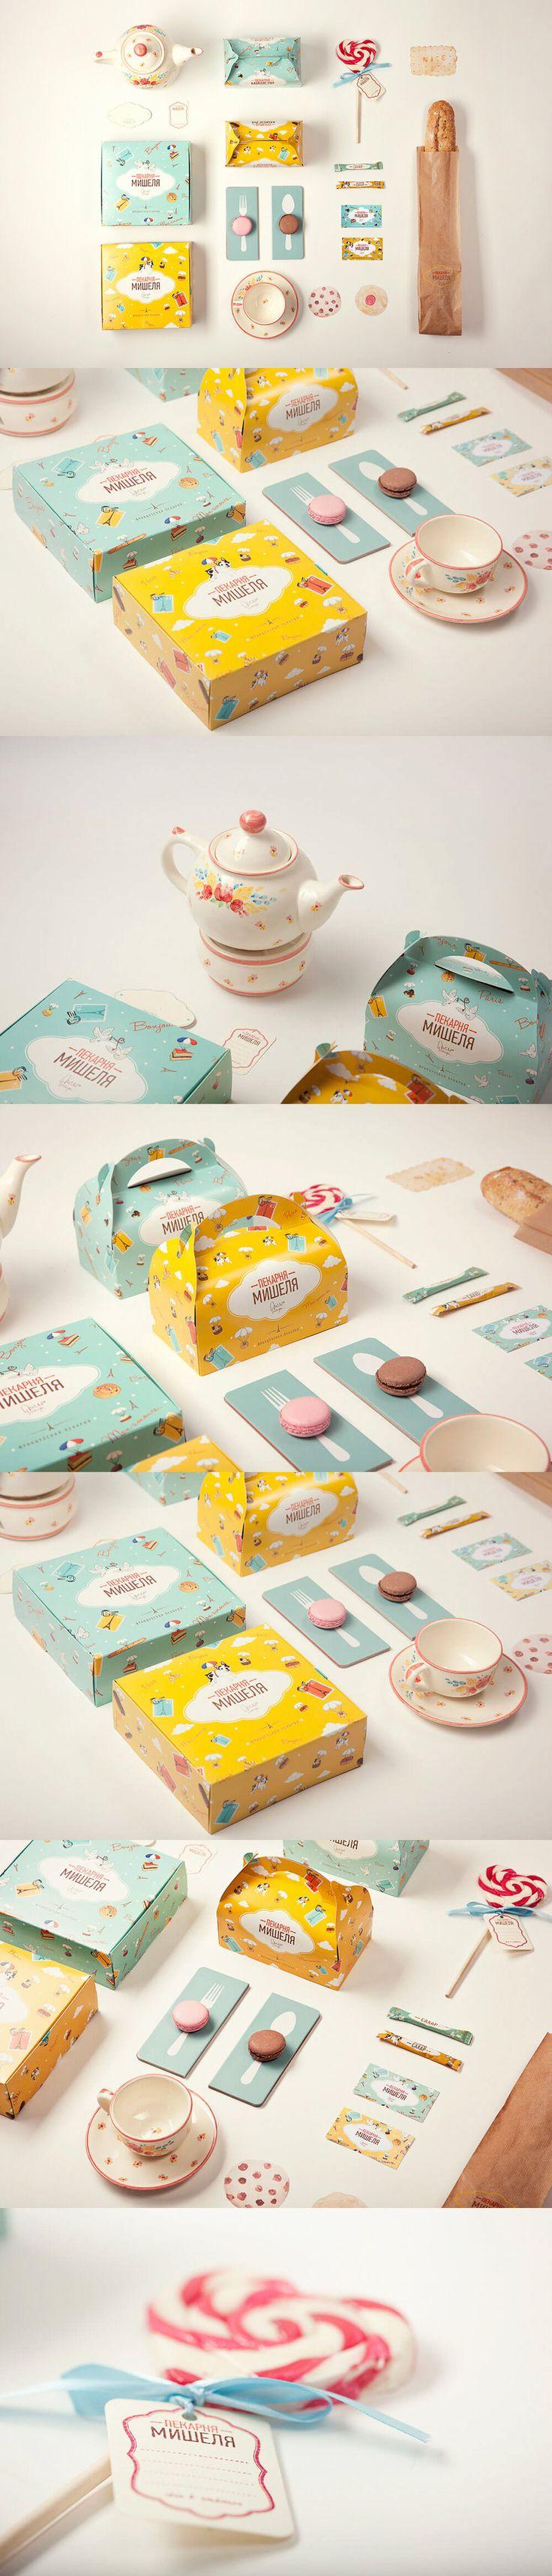 Branding Project: Michelle's Bakery by Anya Aleksandrova